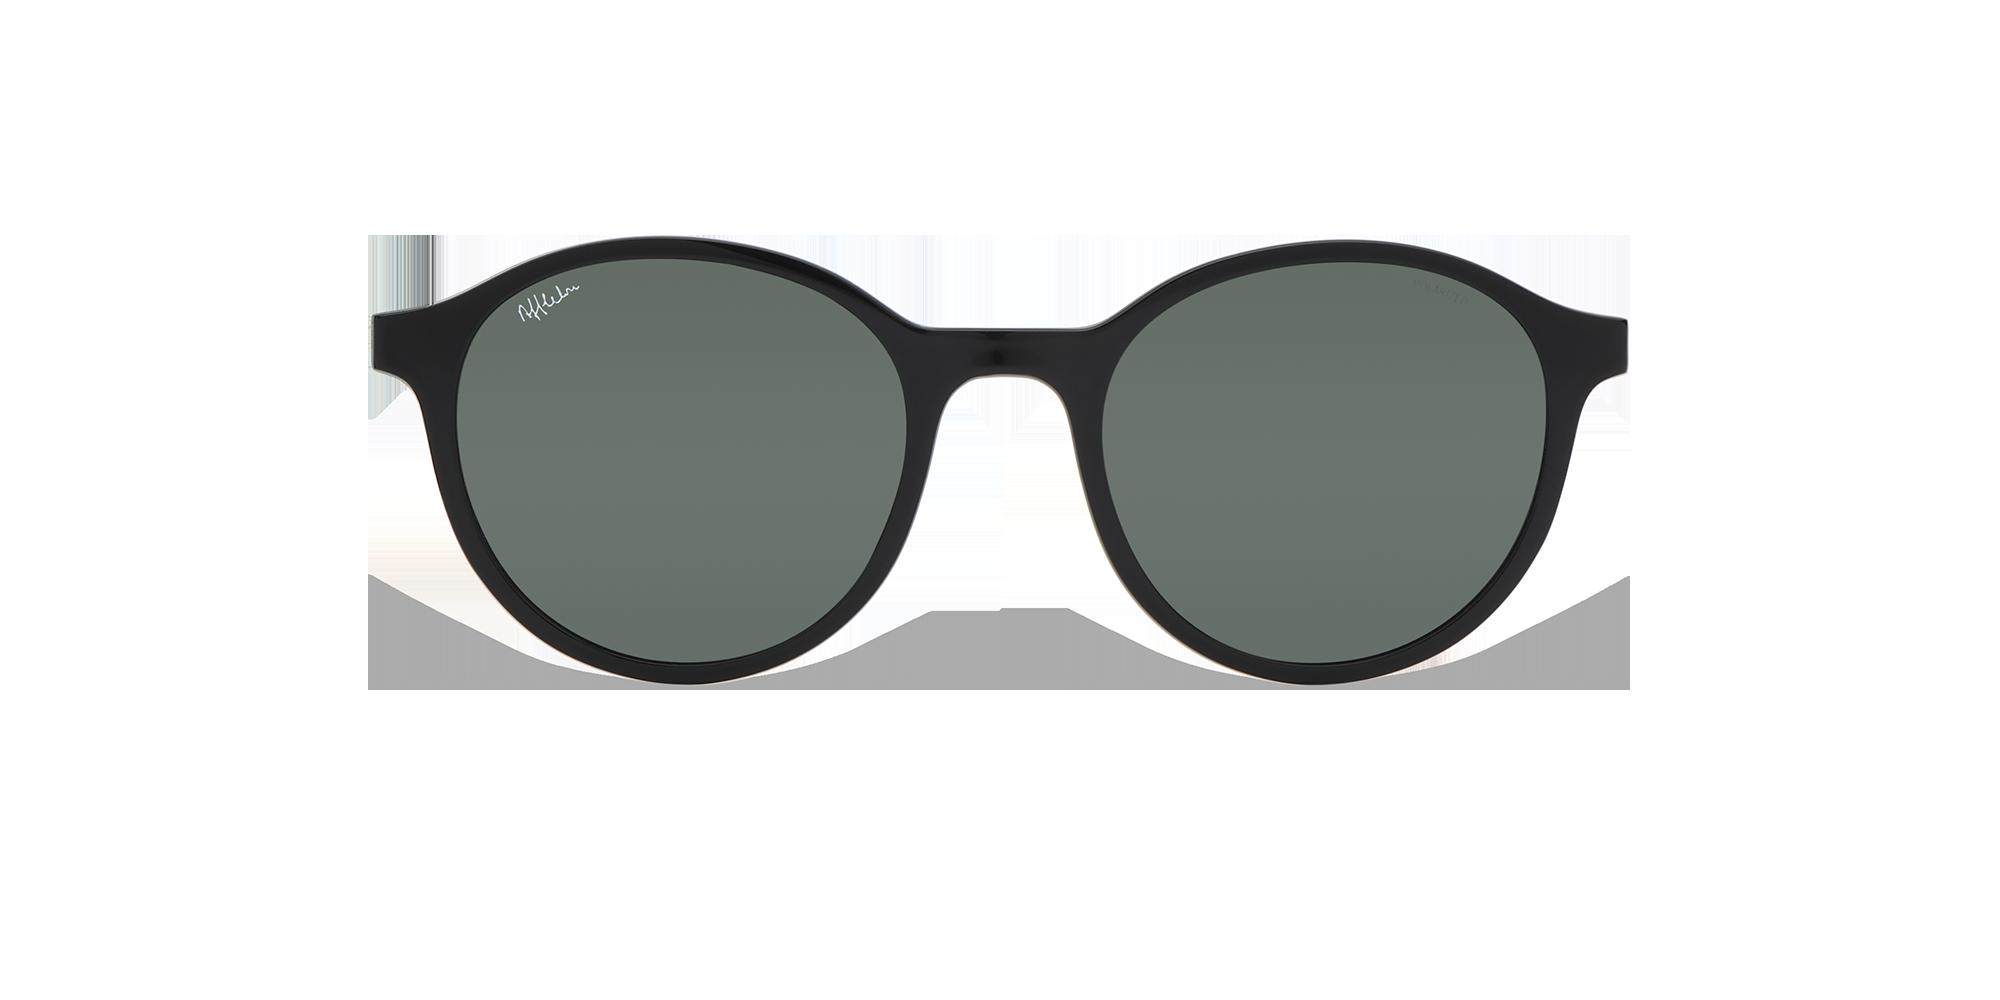 afflelou/france/products/smart_clip/clips_glasses/TMK37POBK014919.png